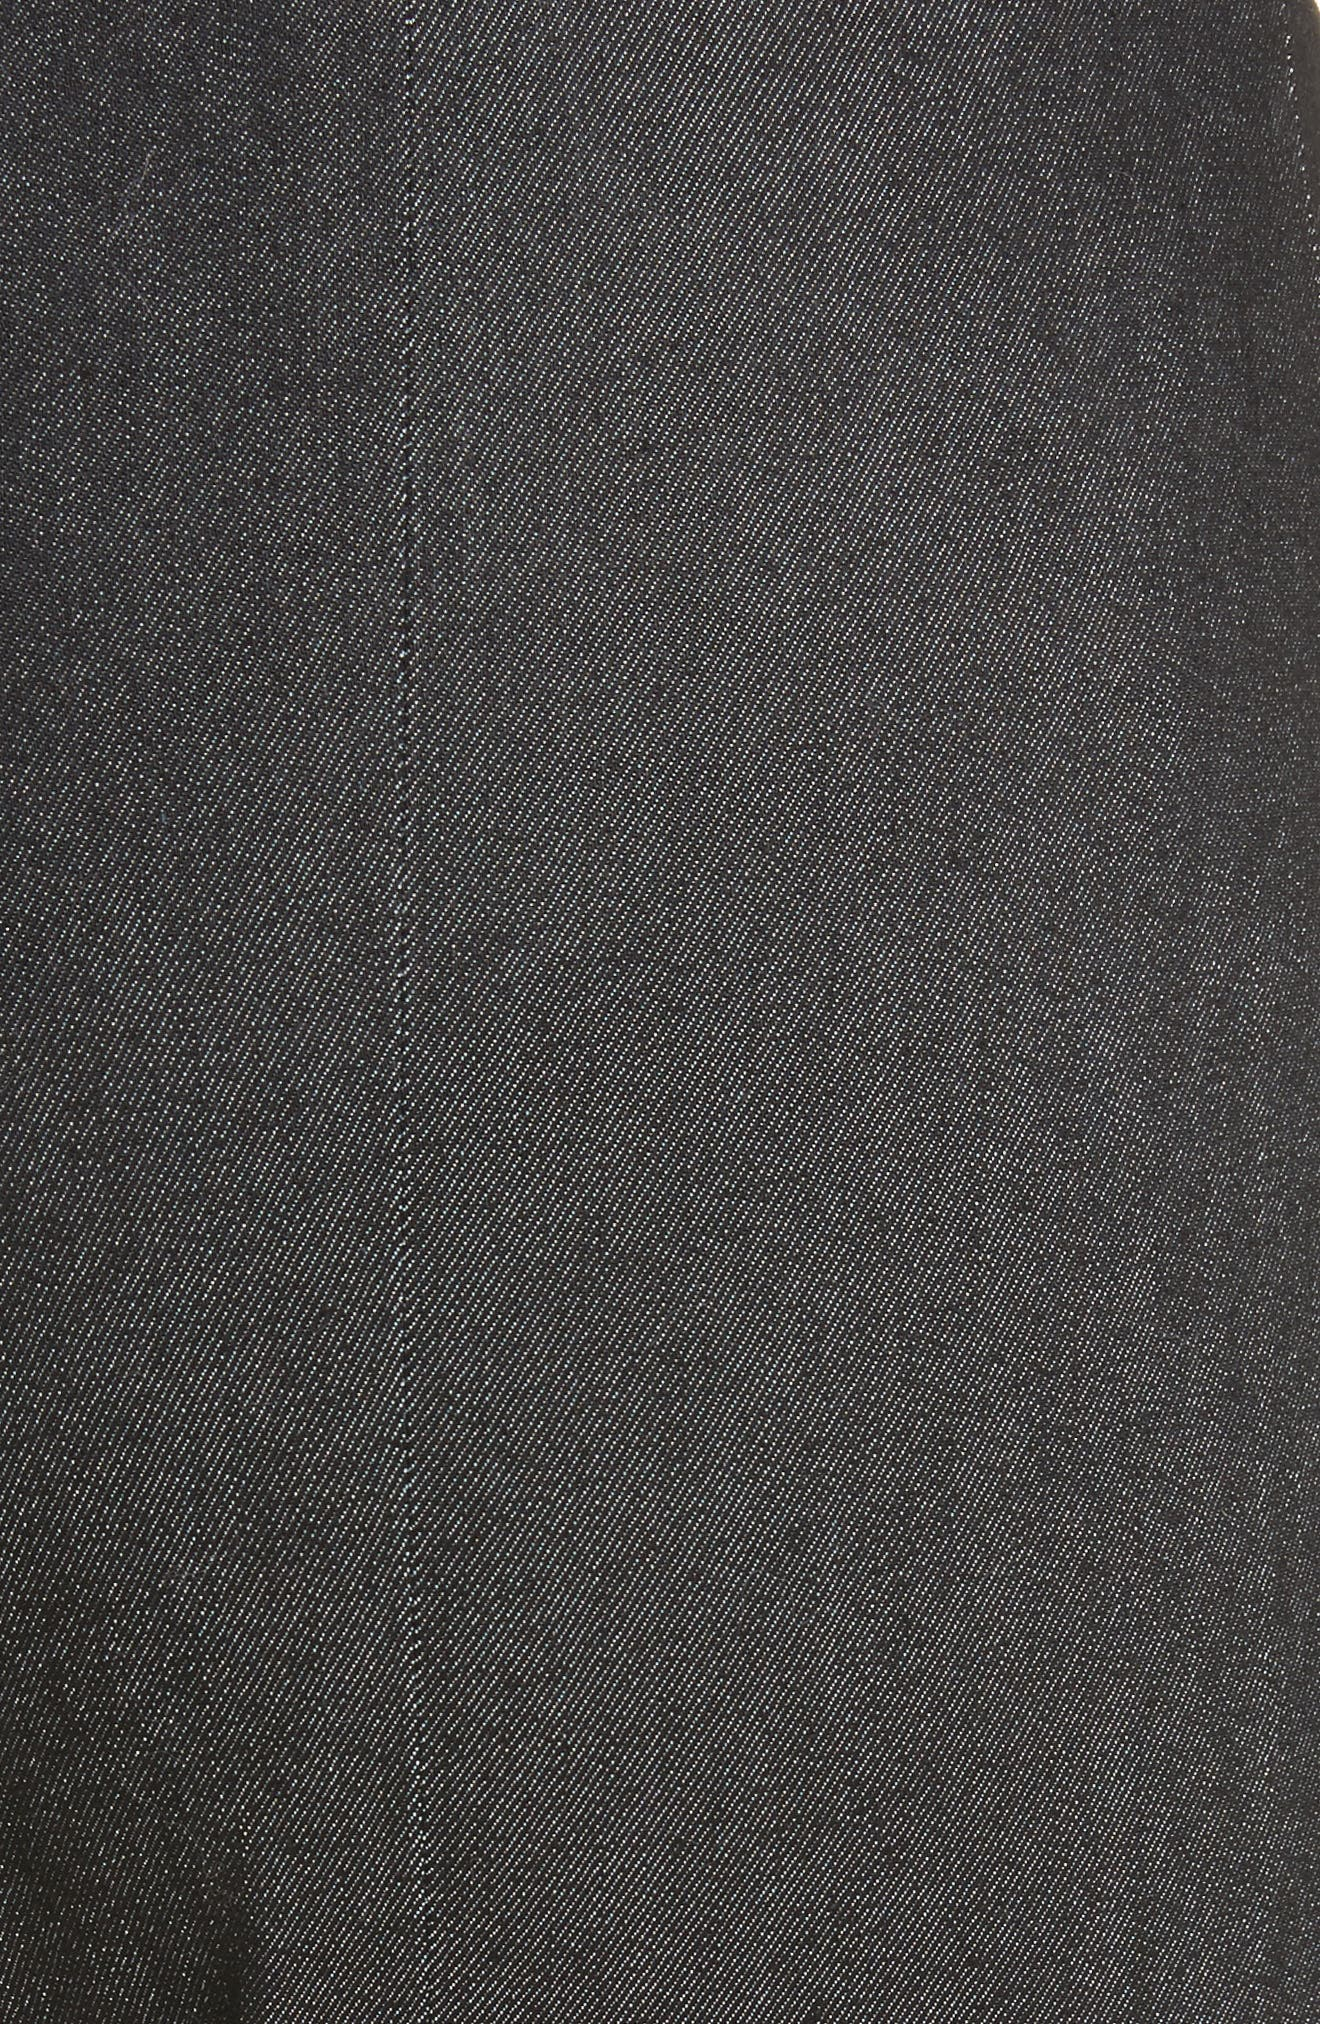 Kiran Lace-Up Stretch Denim Pants,                             Alternate thumbnail 5, color,                             001